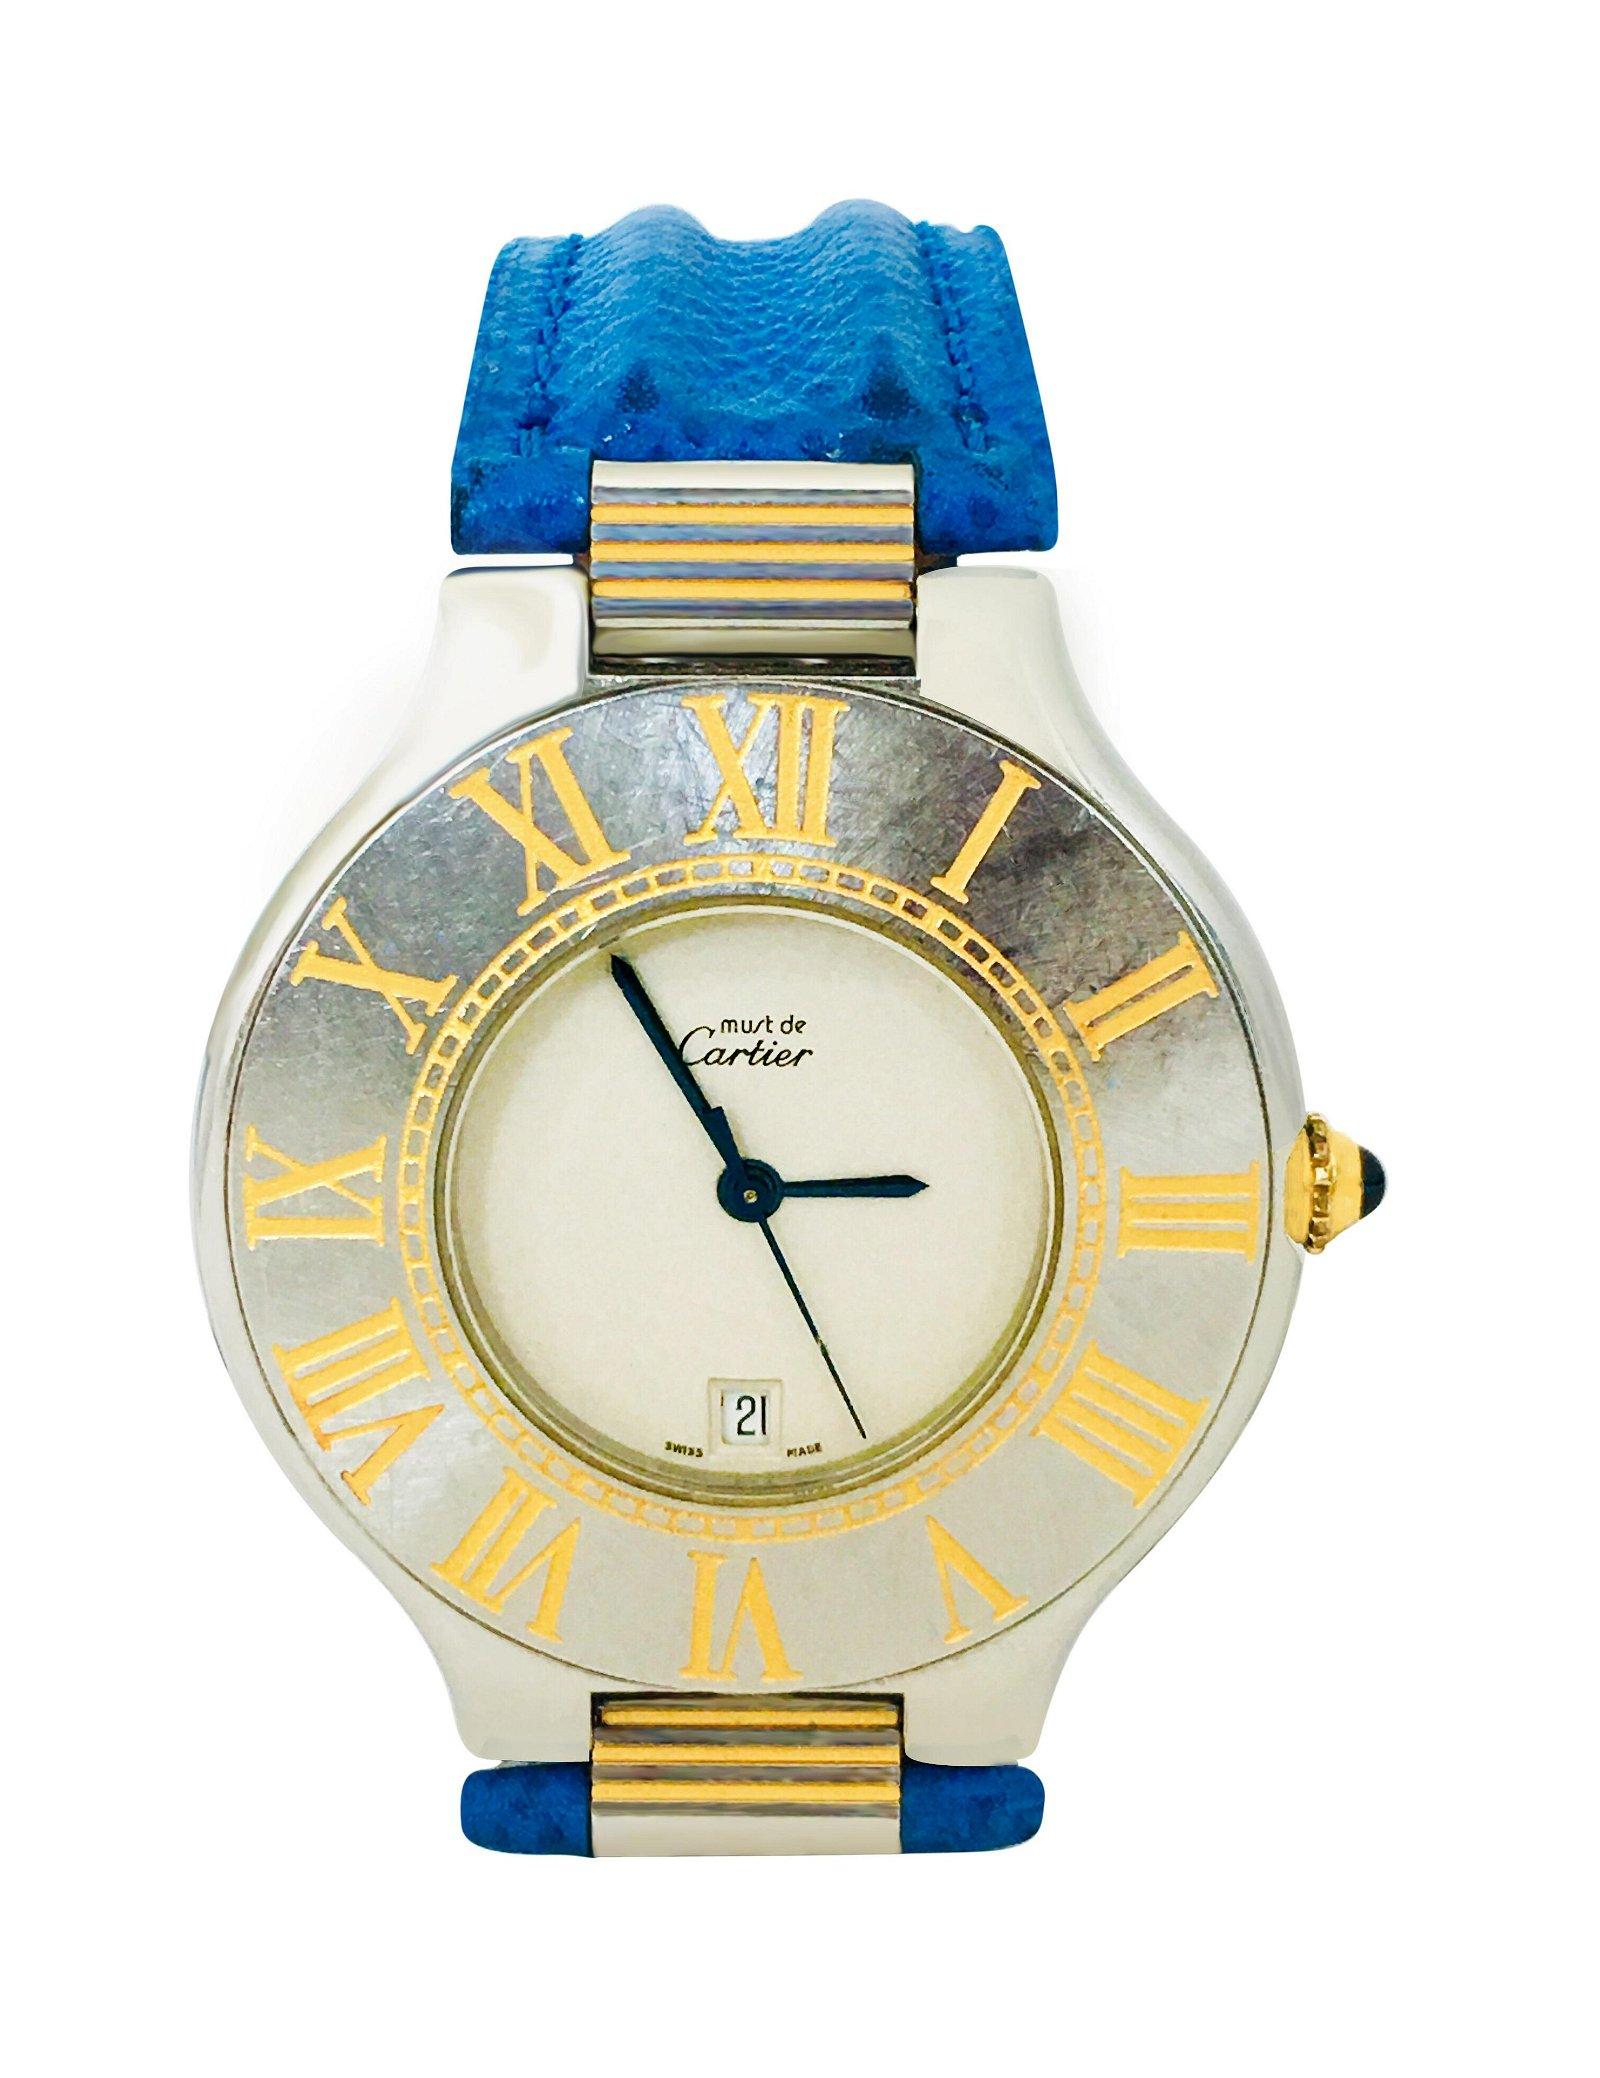 Cartier 21 Must de Cartier, Gold & Steel Date Watch